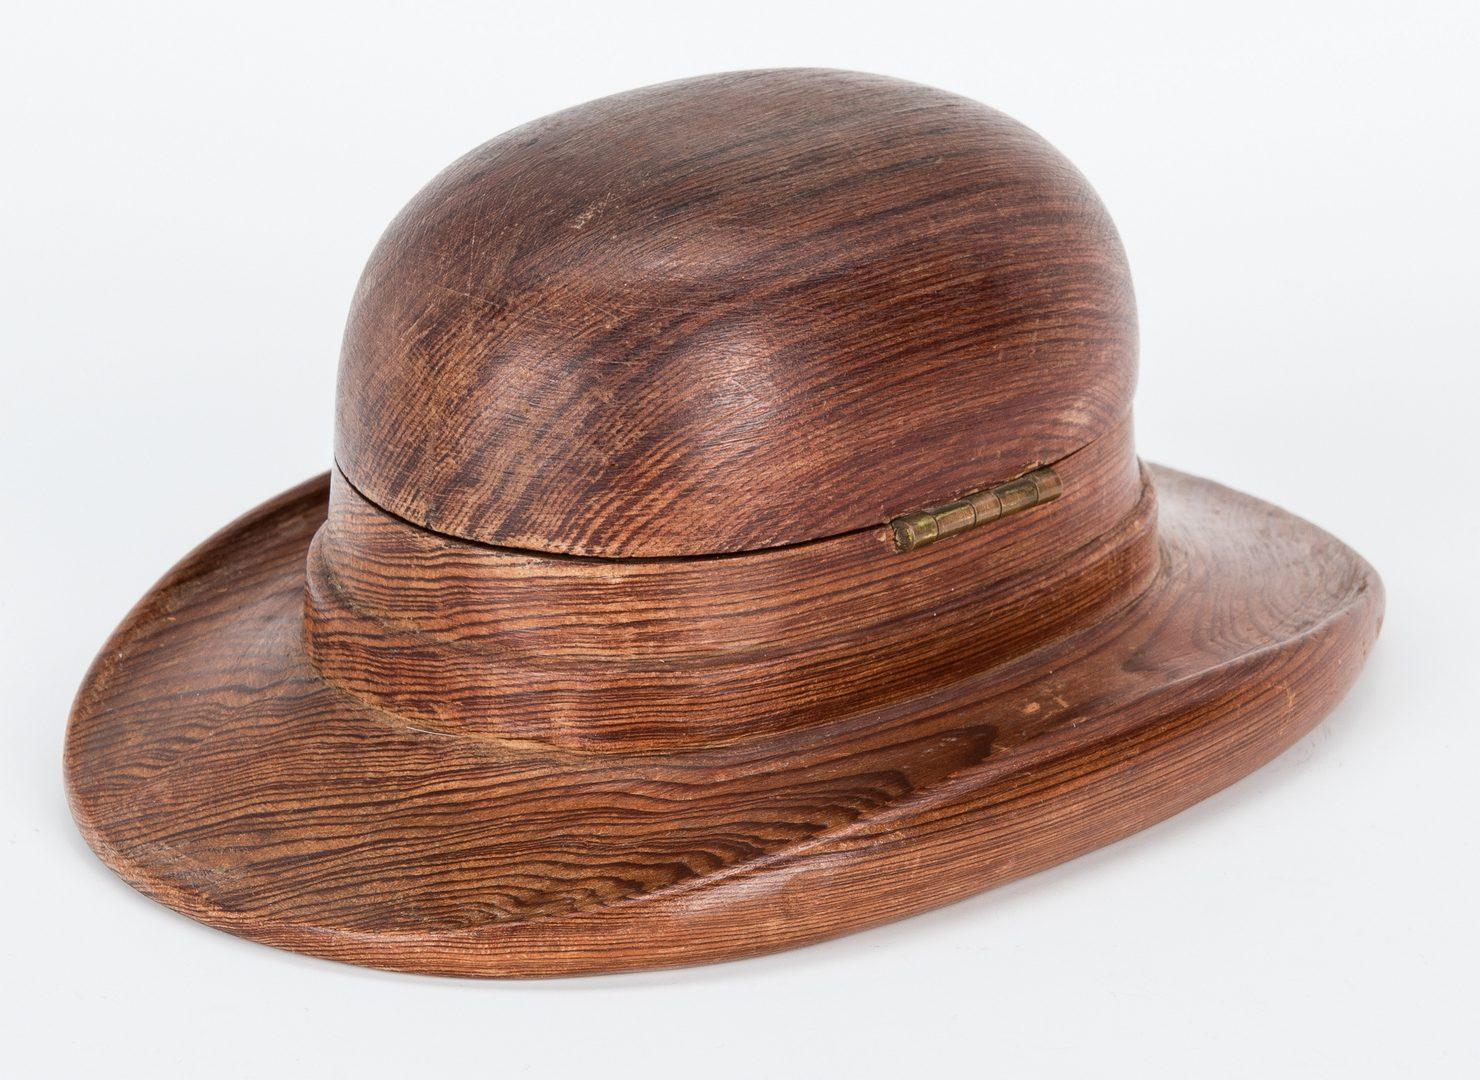 Lot 707: Wood Brown Derby Hat Cigarette Box